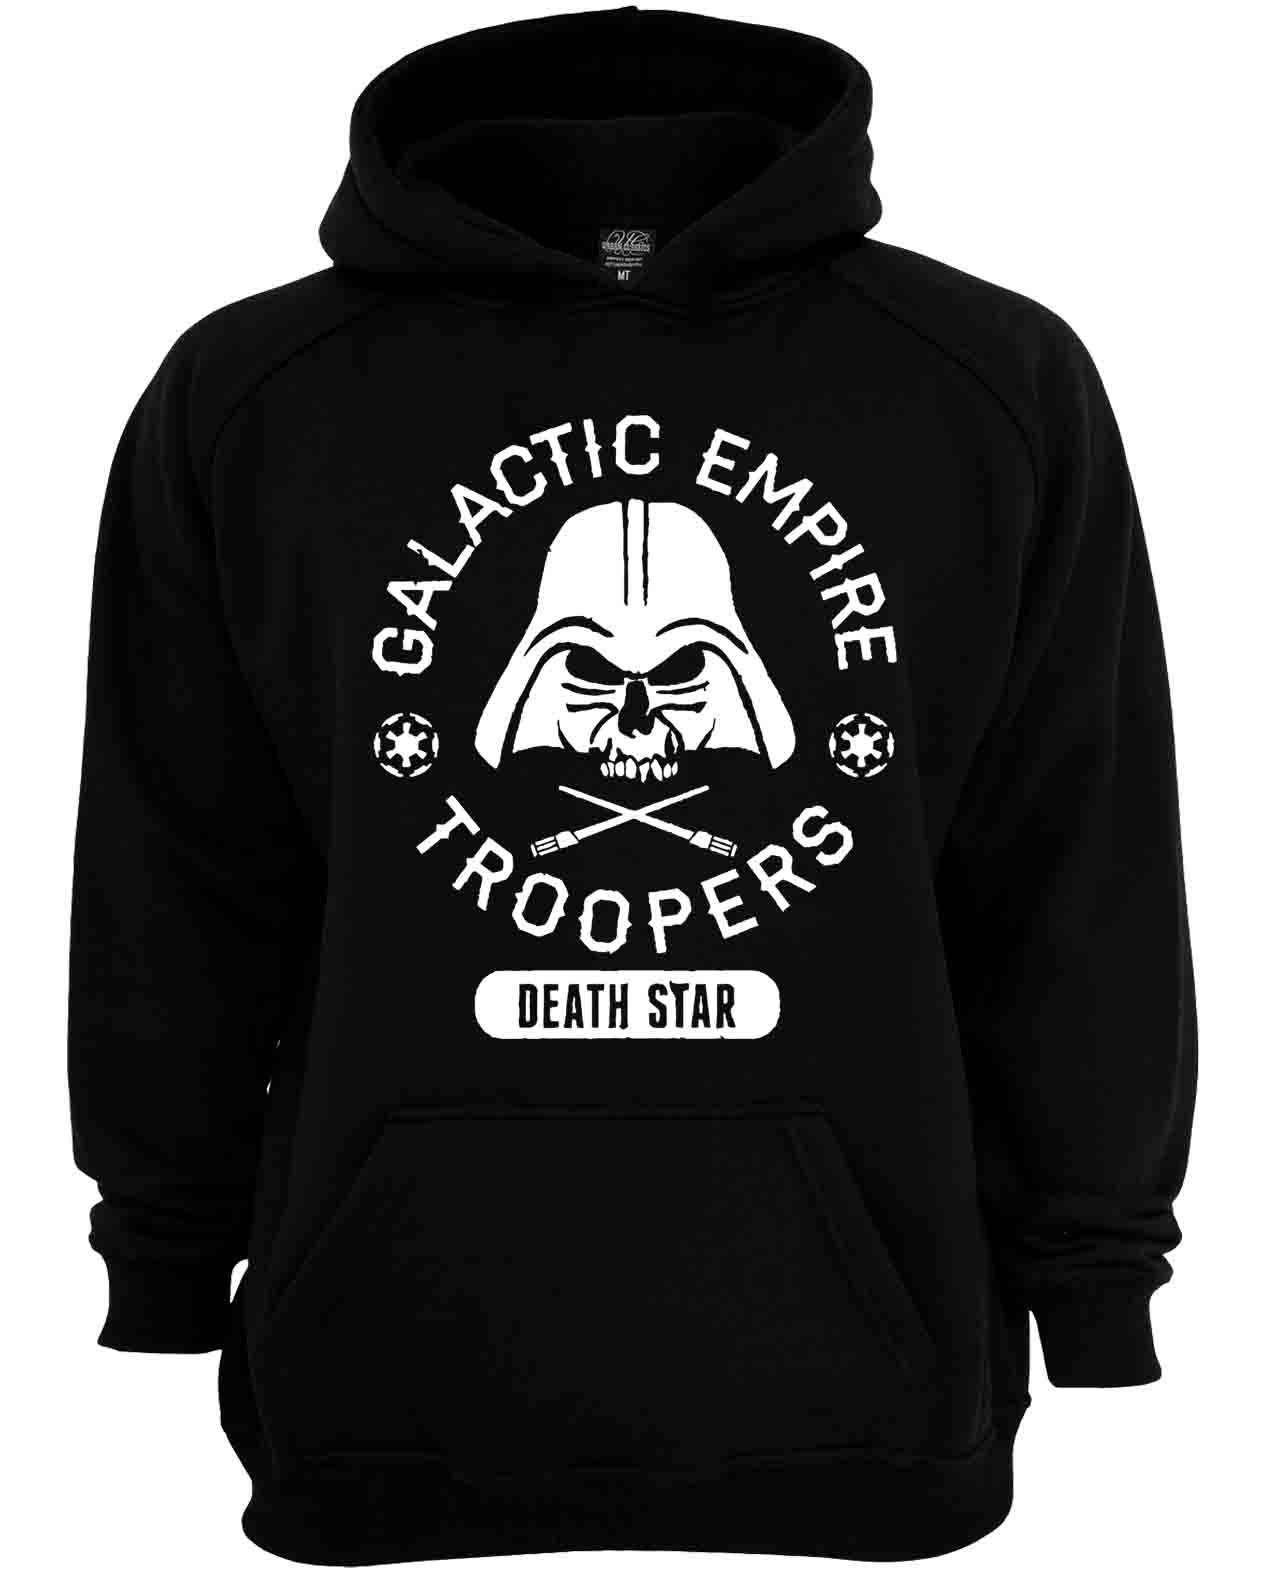 Star Wars - Galactic Empire